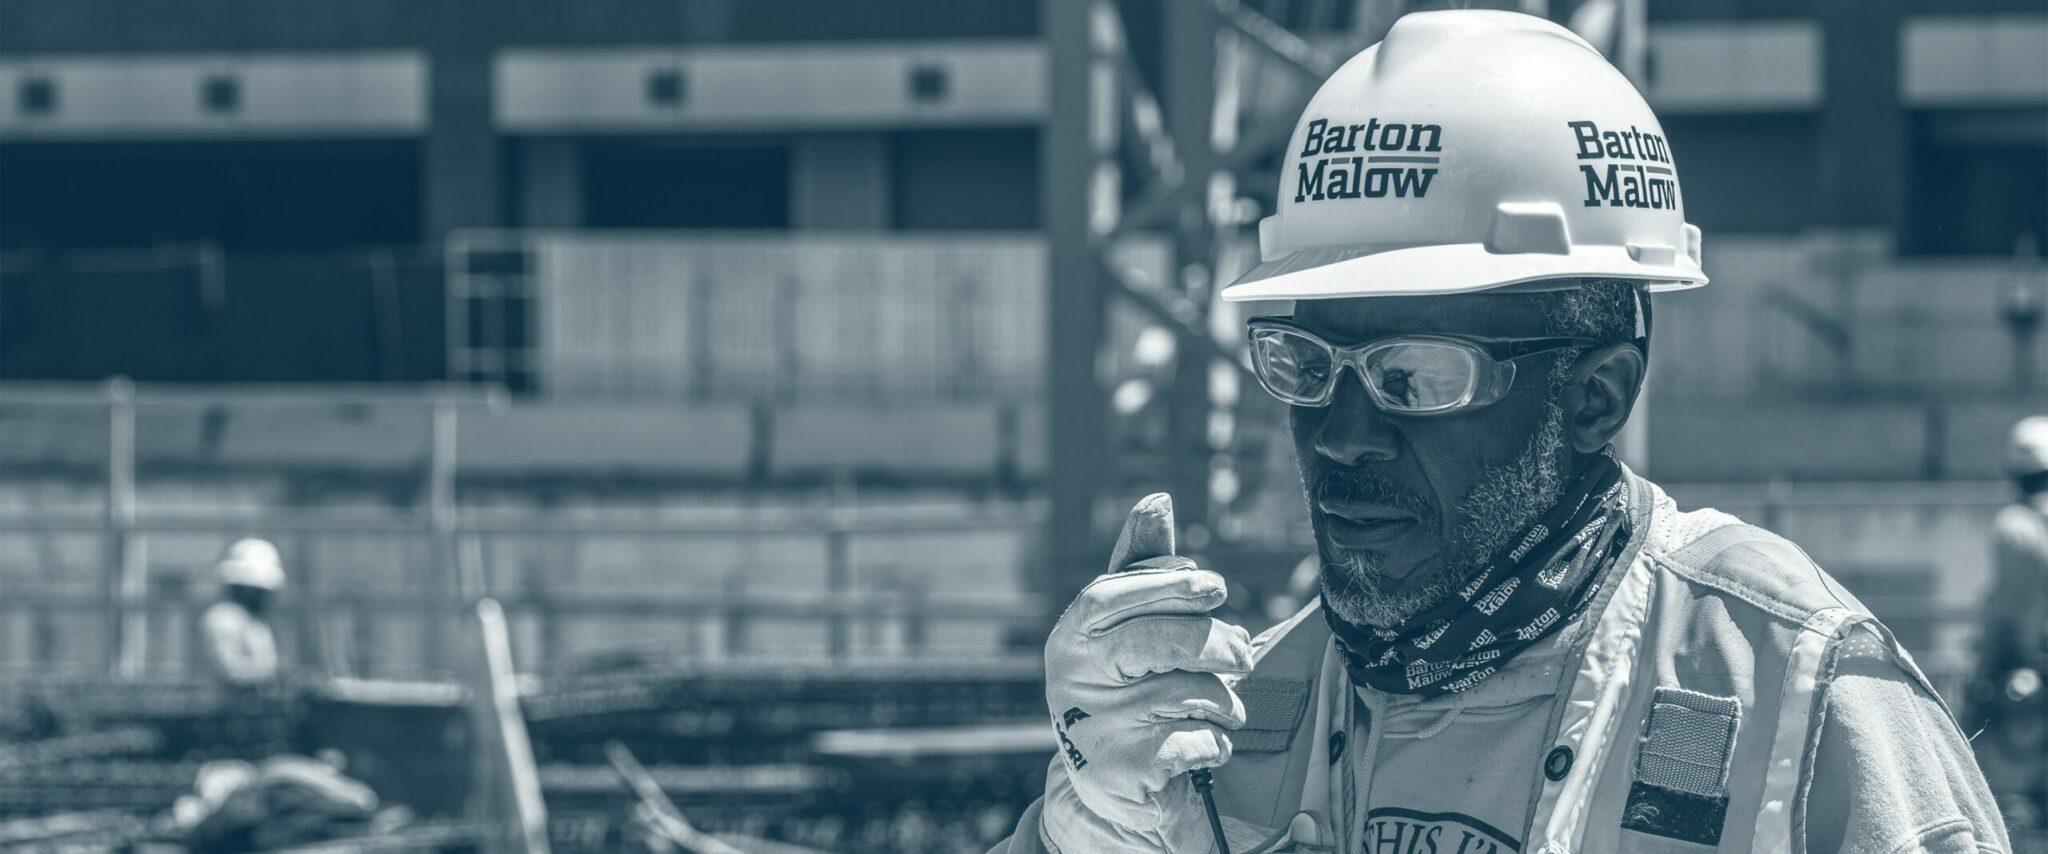 Construction worker talking over intercom